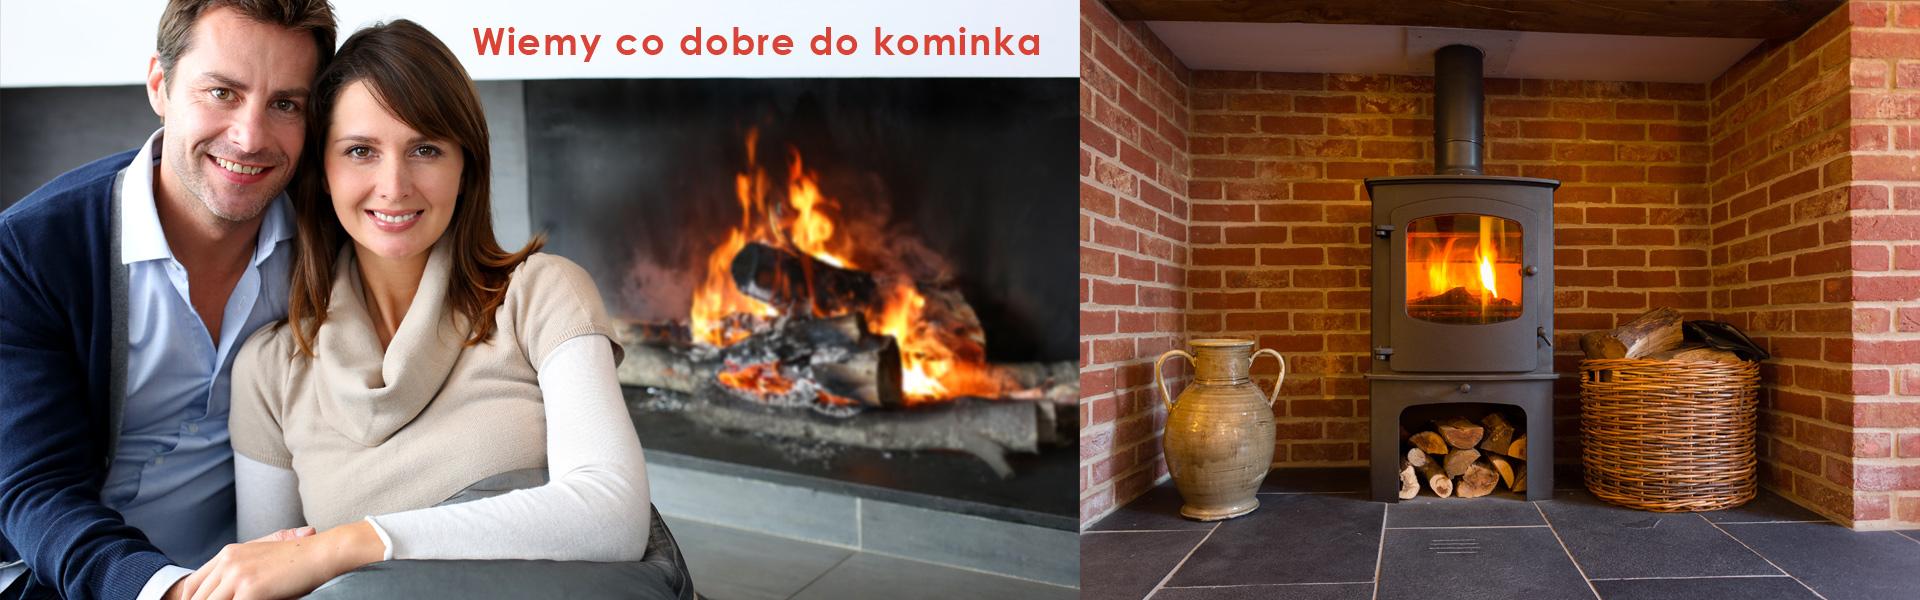 Drewno-do-kominka-Gniezno-slider-1920x600